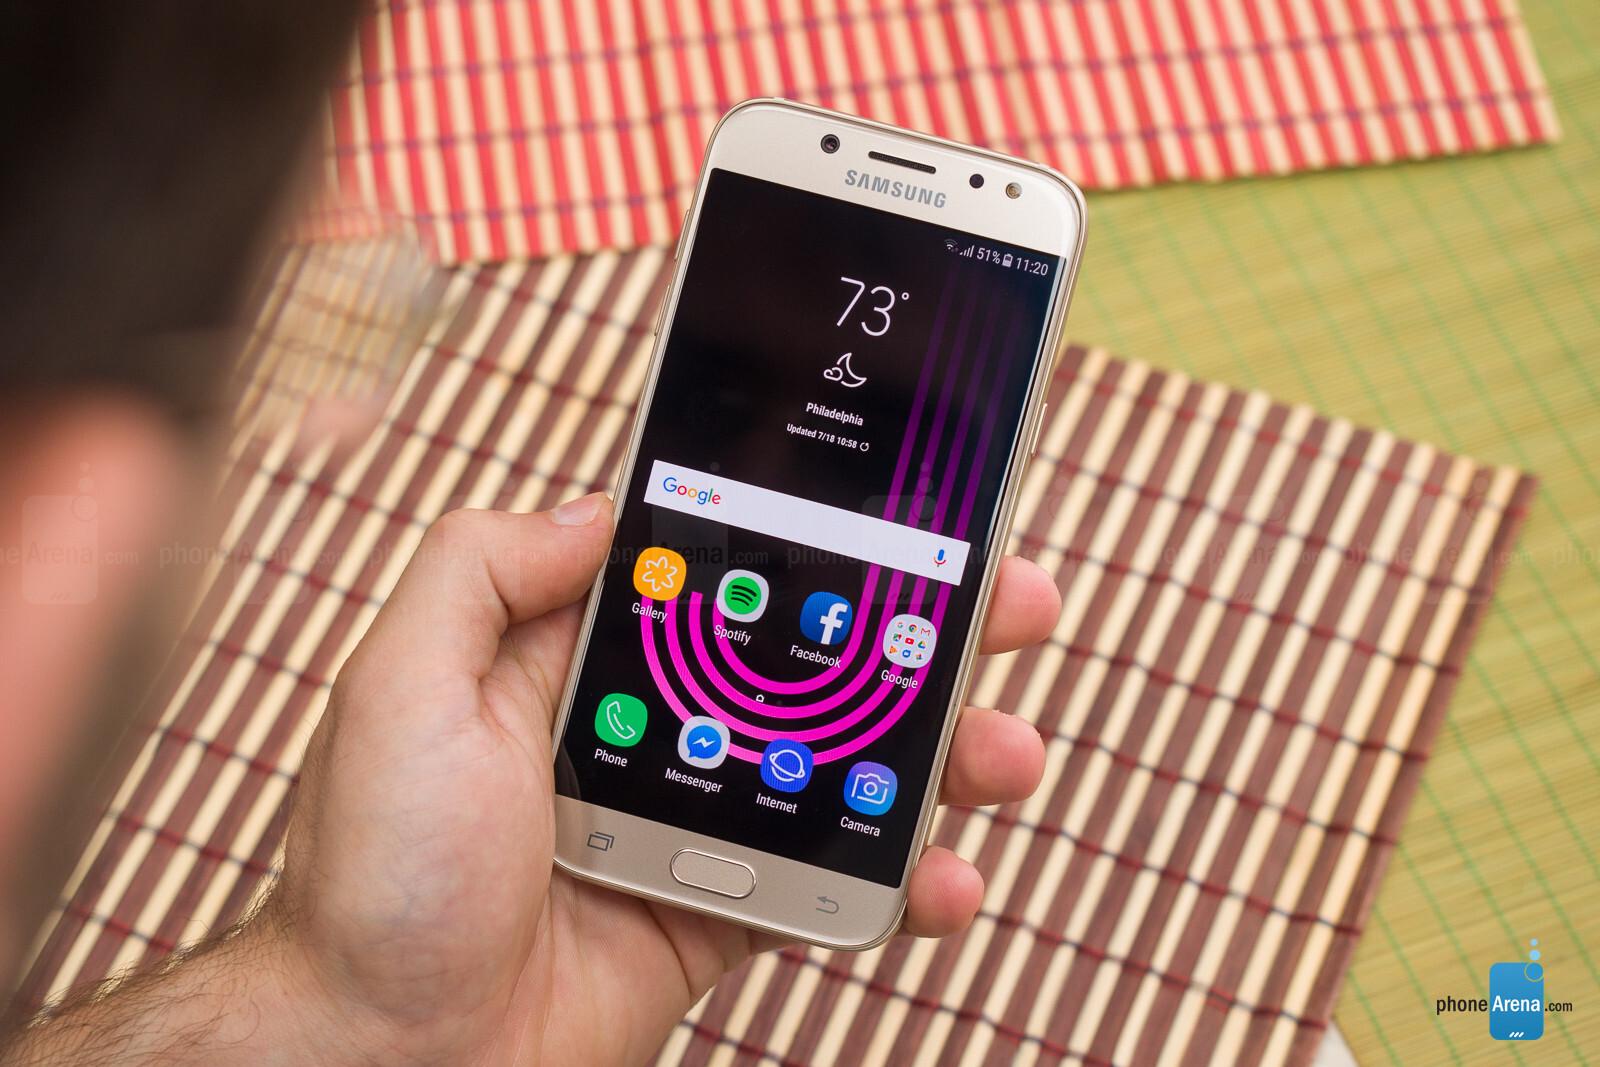 Samsung Galaxy J5 (2017) Review - PhoneArena